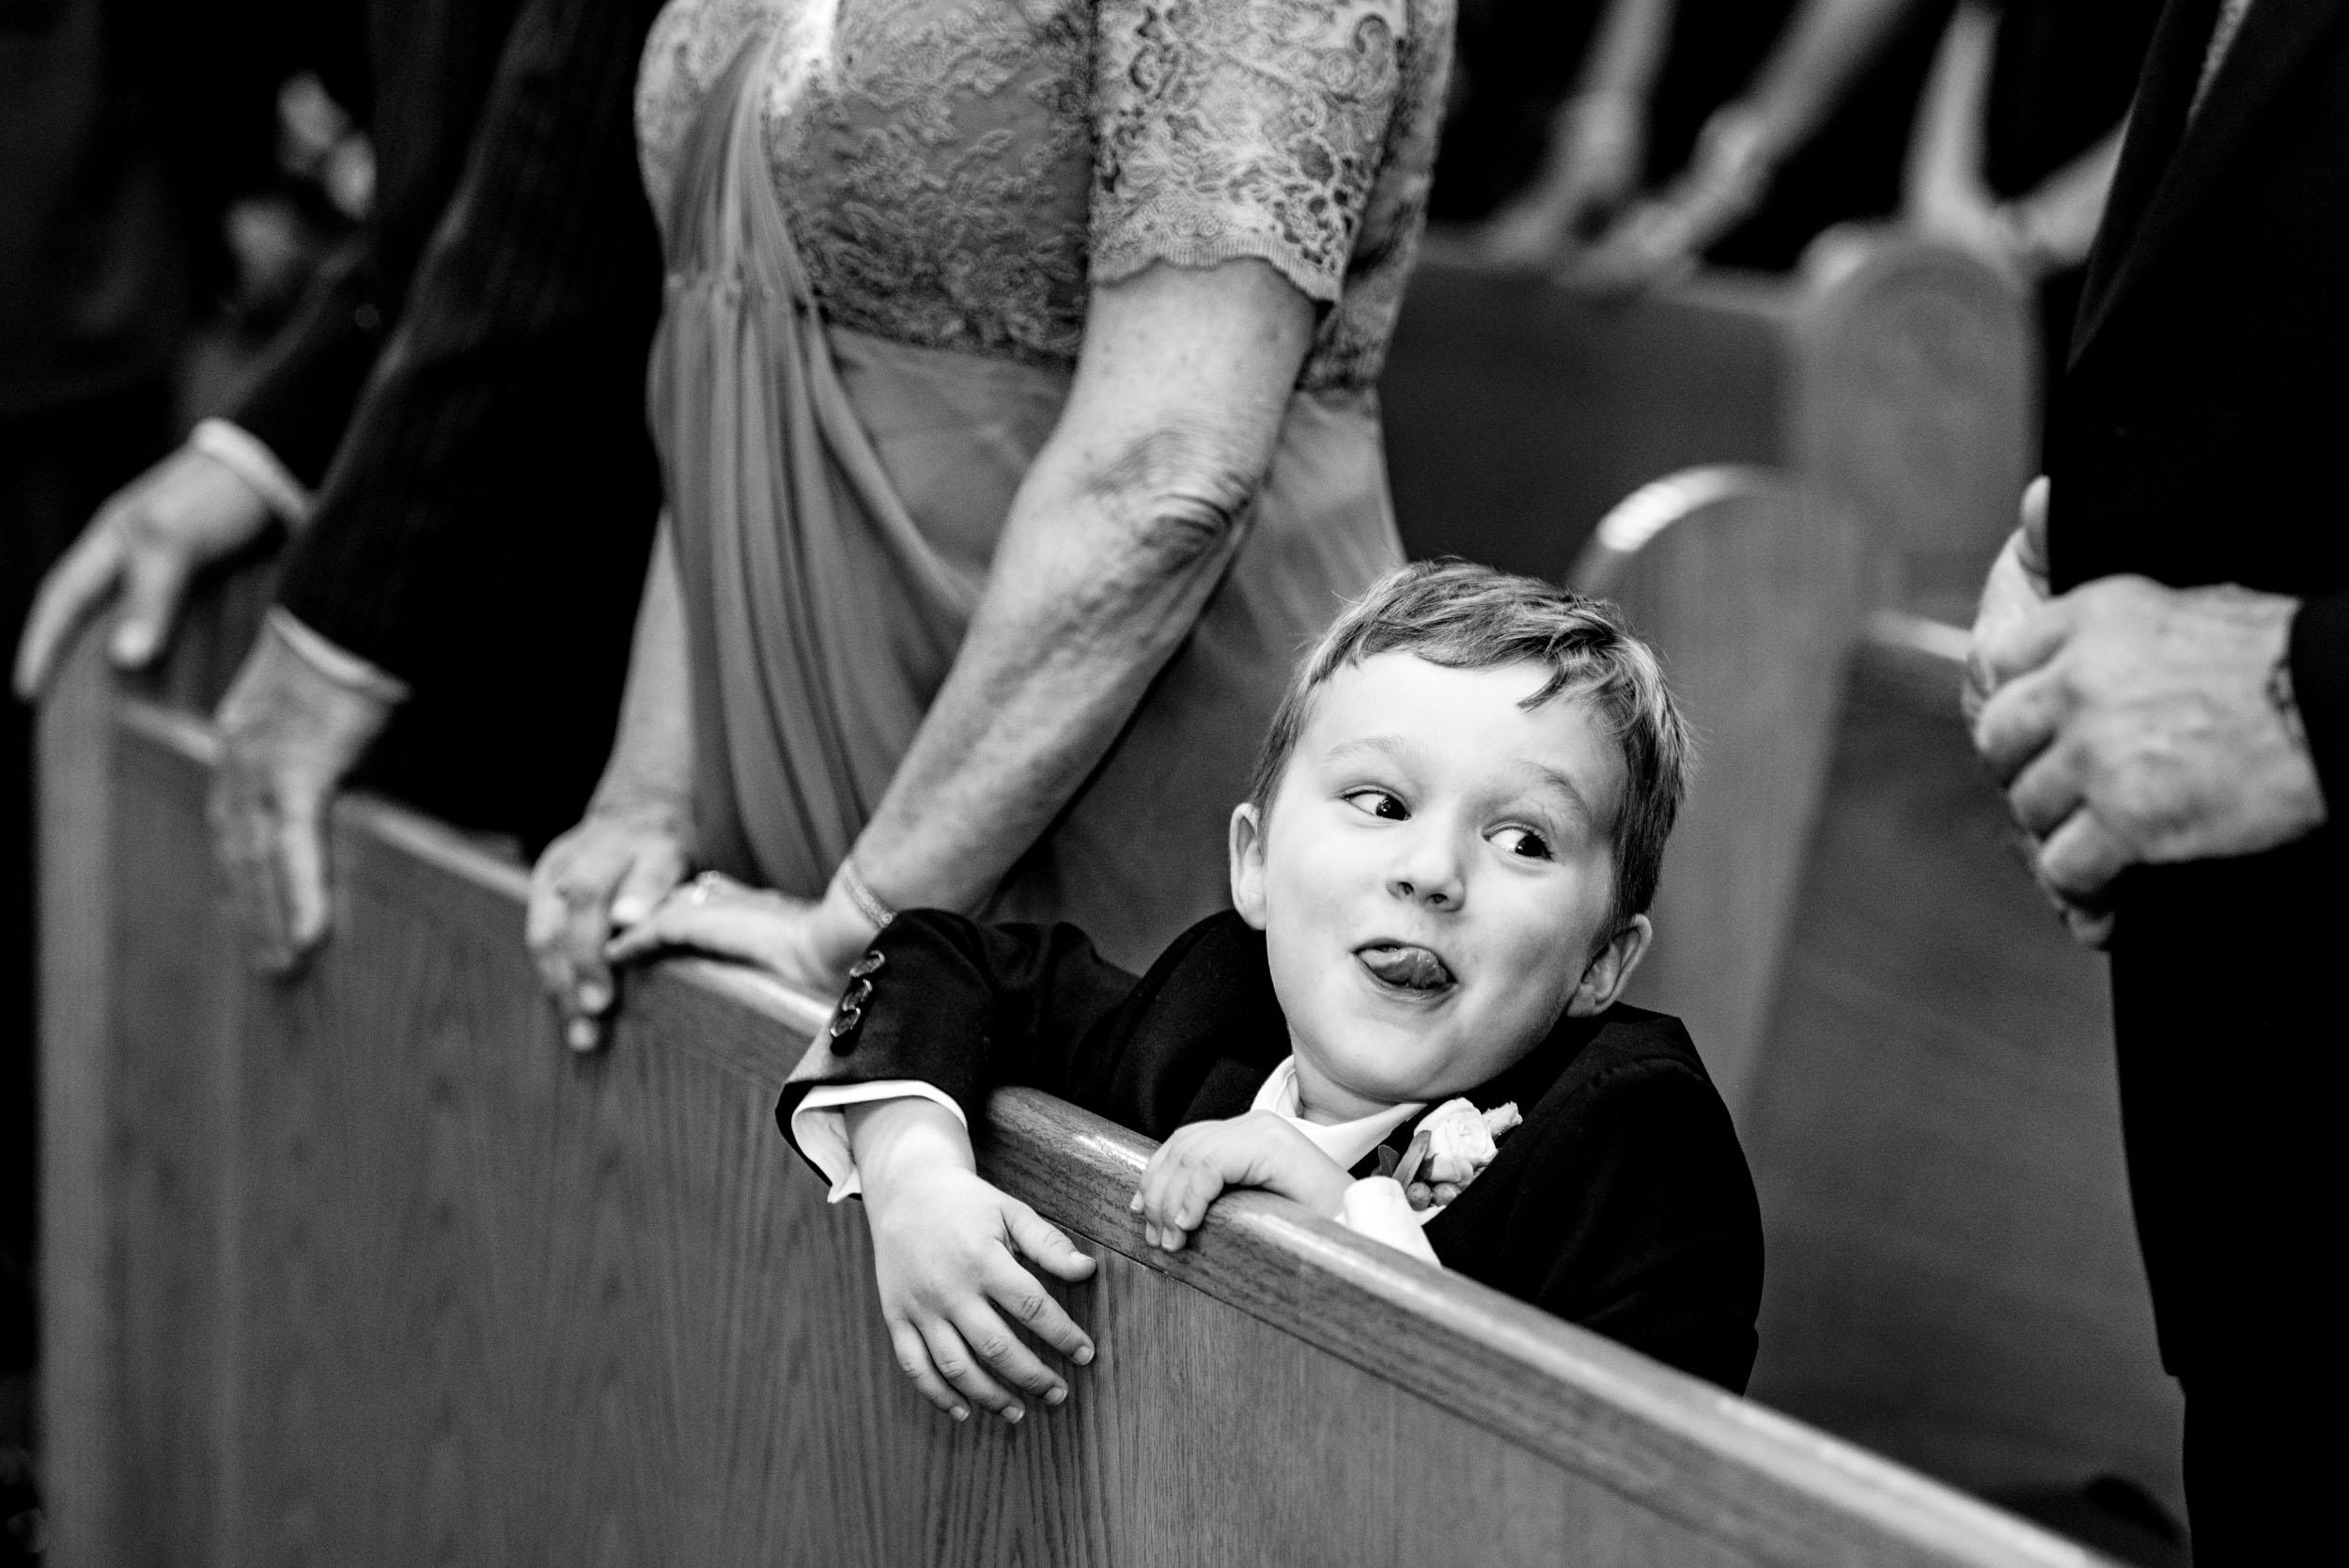 toronto-london-ontario-wedding-photographer-kid.jpg